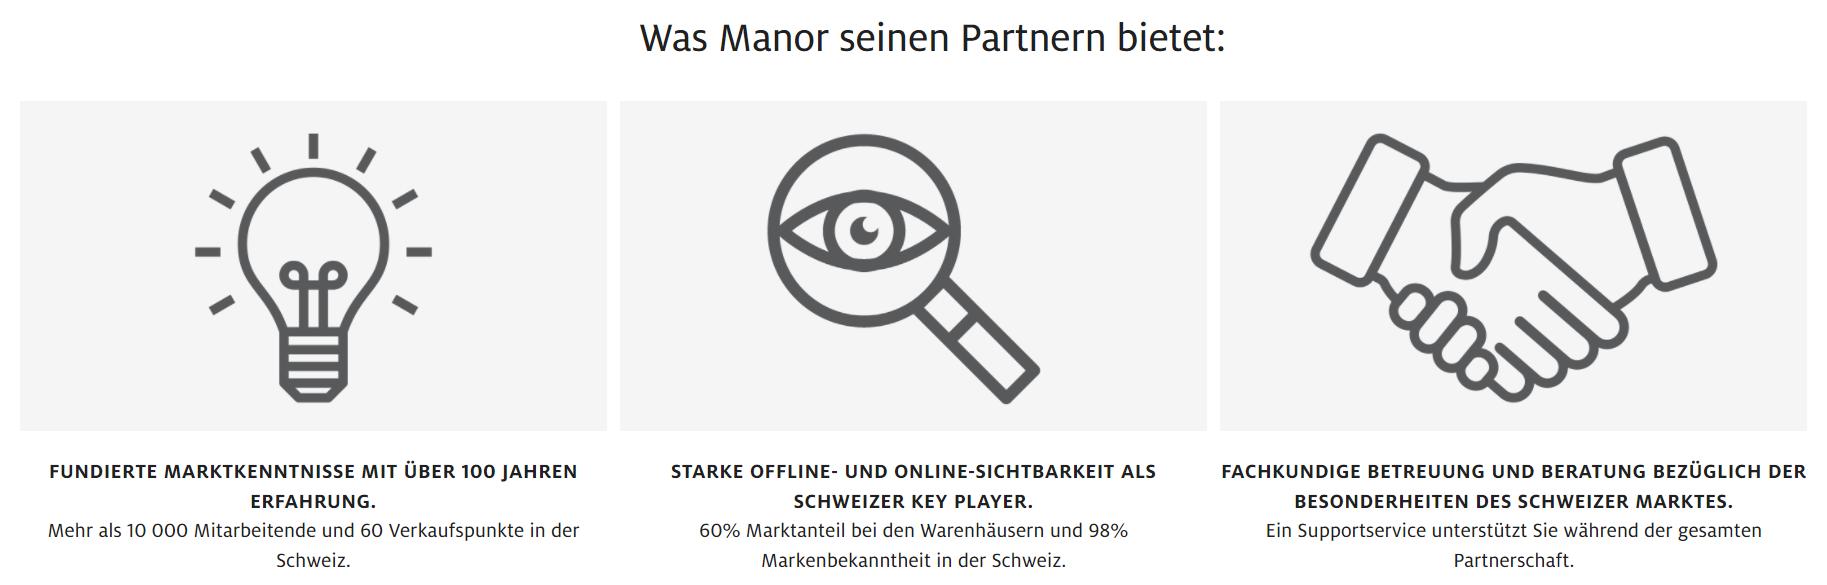 Manor Marketplace-Partner Angebot